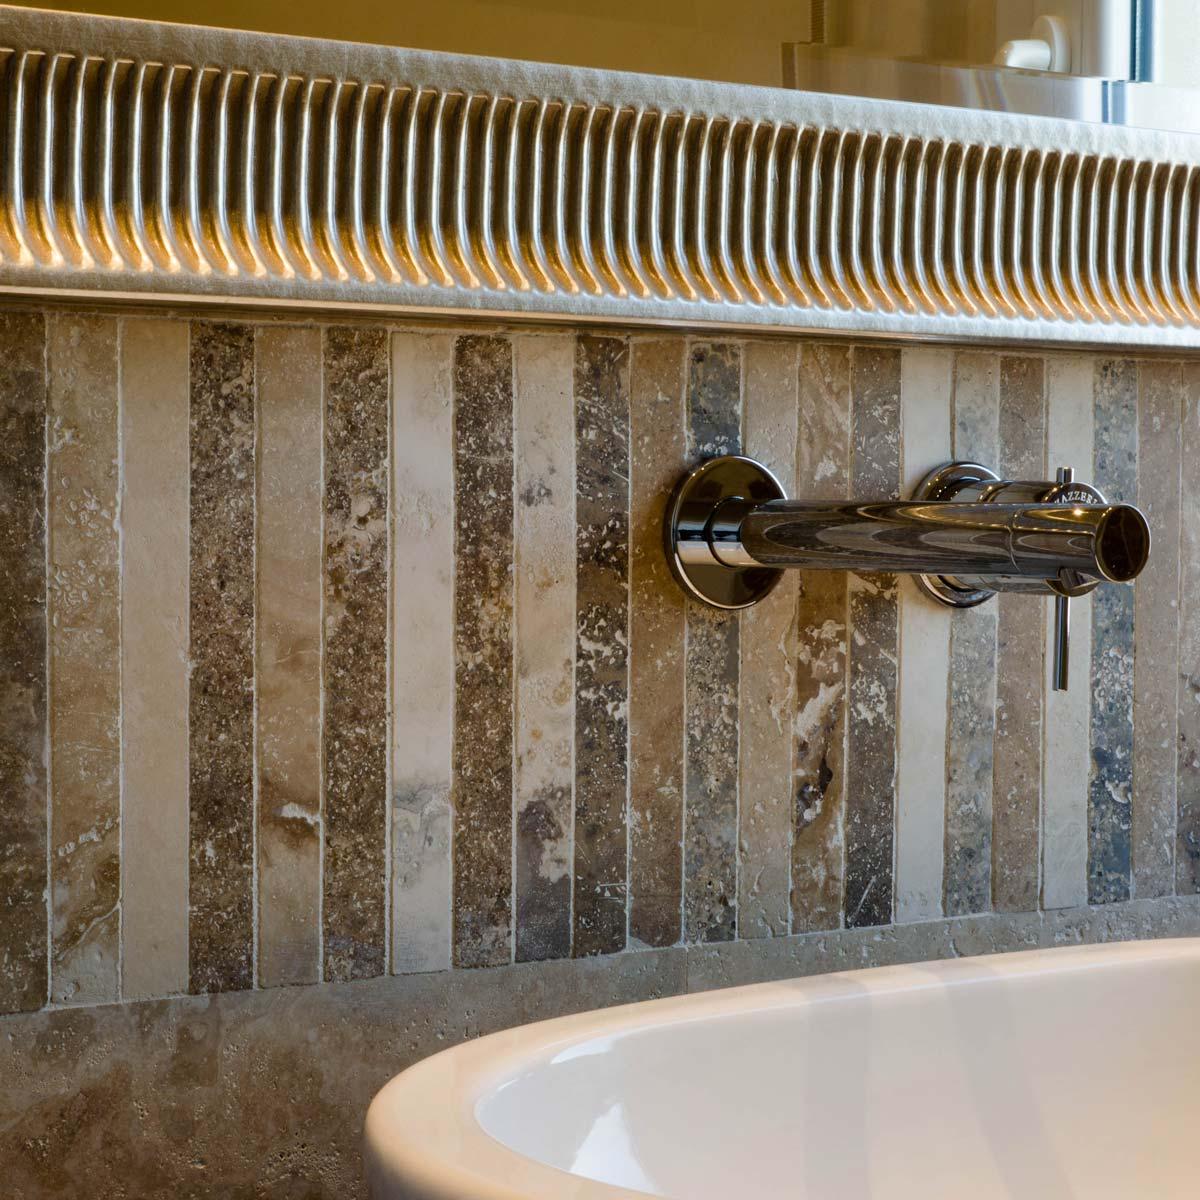 barre-verticali-in-travertino-in-rivestimento-bagno